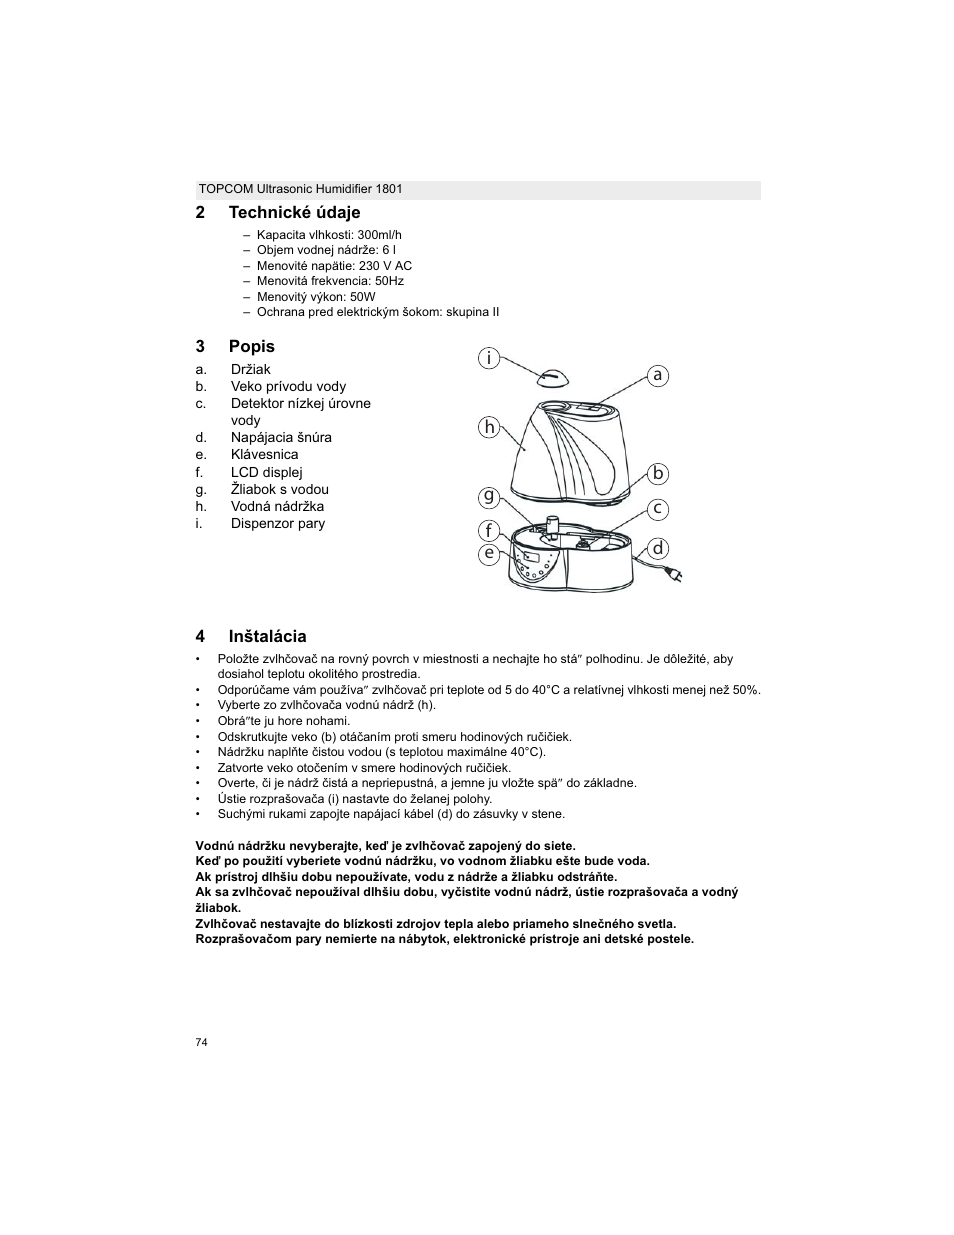 topcom ultrasonic 1801 user manual page 74 80 original mode rh manualsdir com topcom butler e700 user manual topcom twintalker 1300 user manual